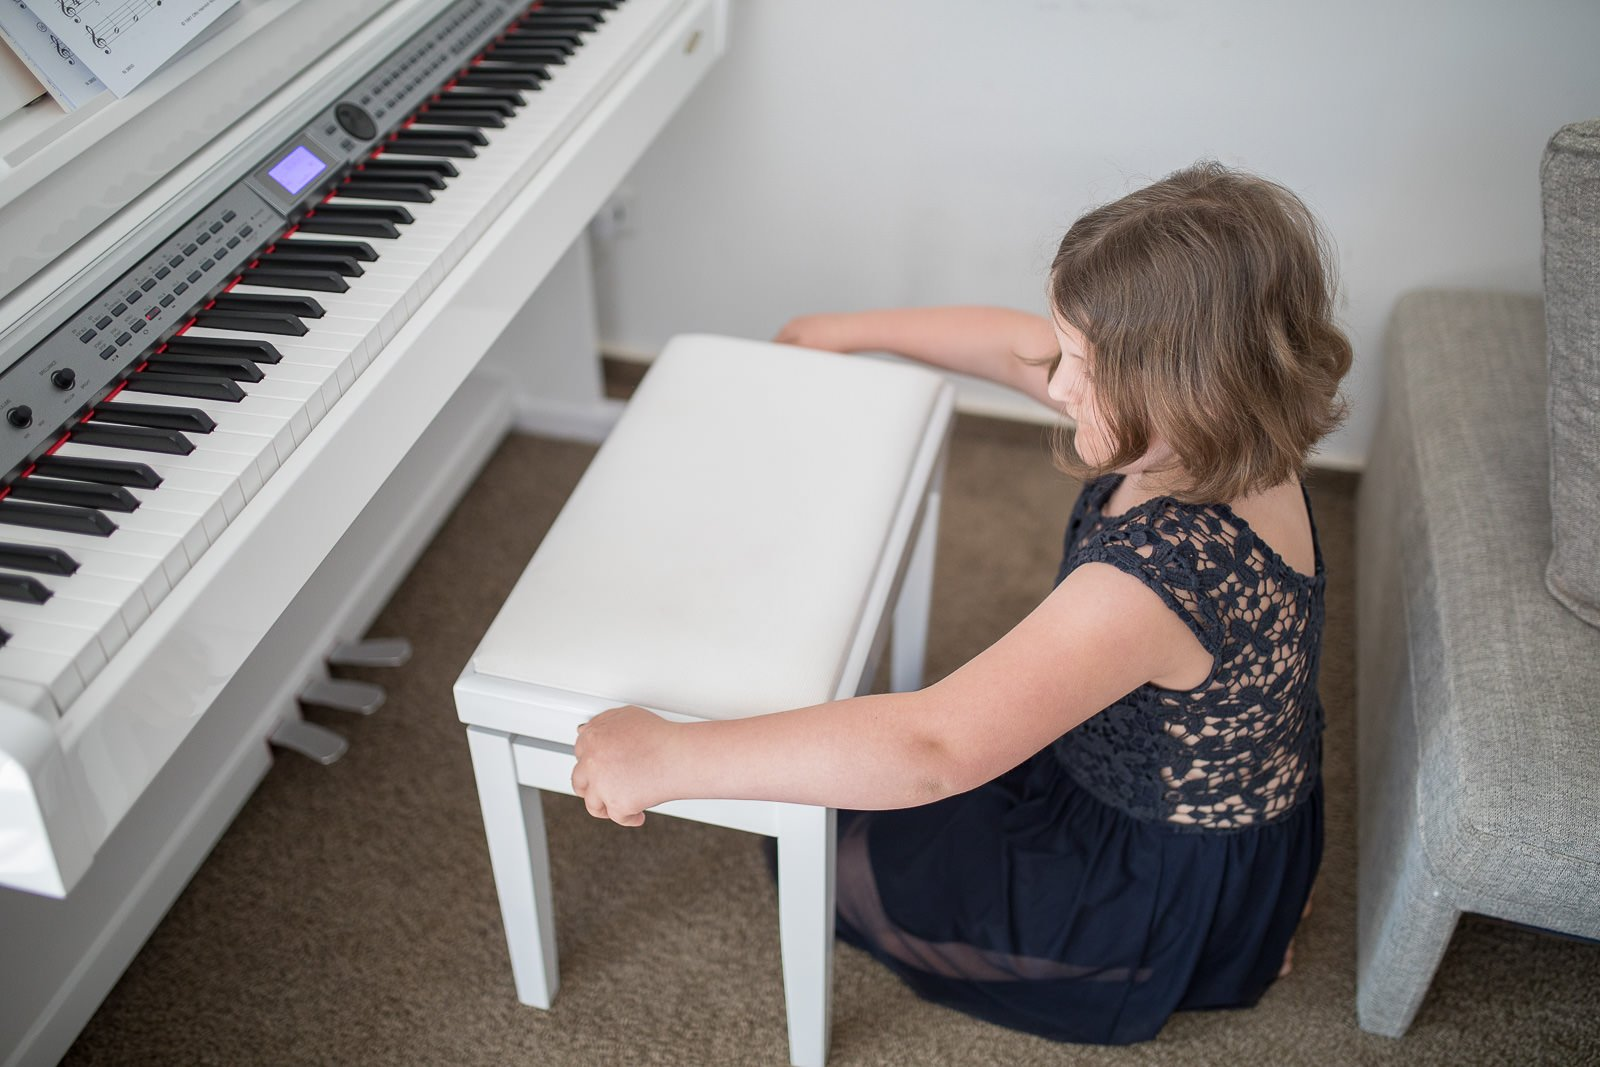 Piano bank höhenverstellbar